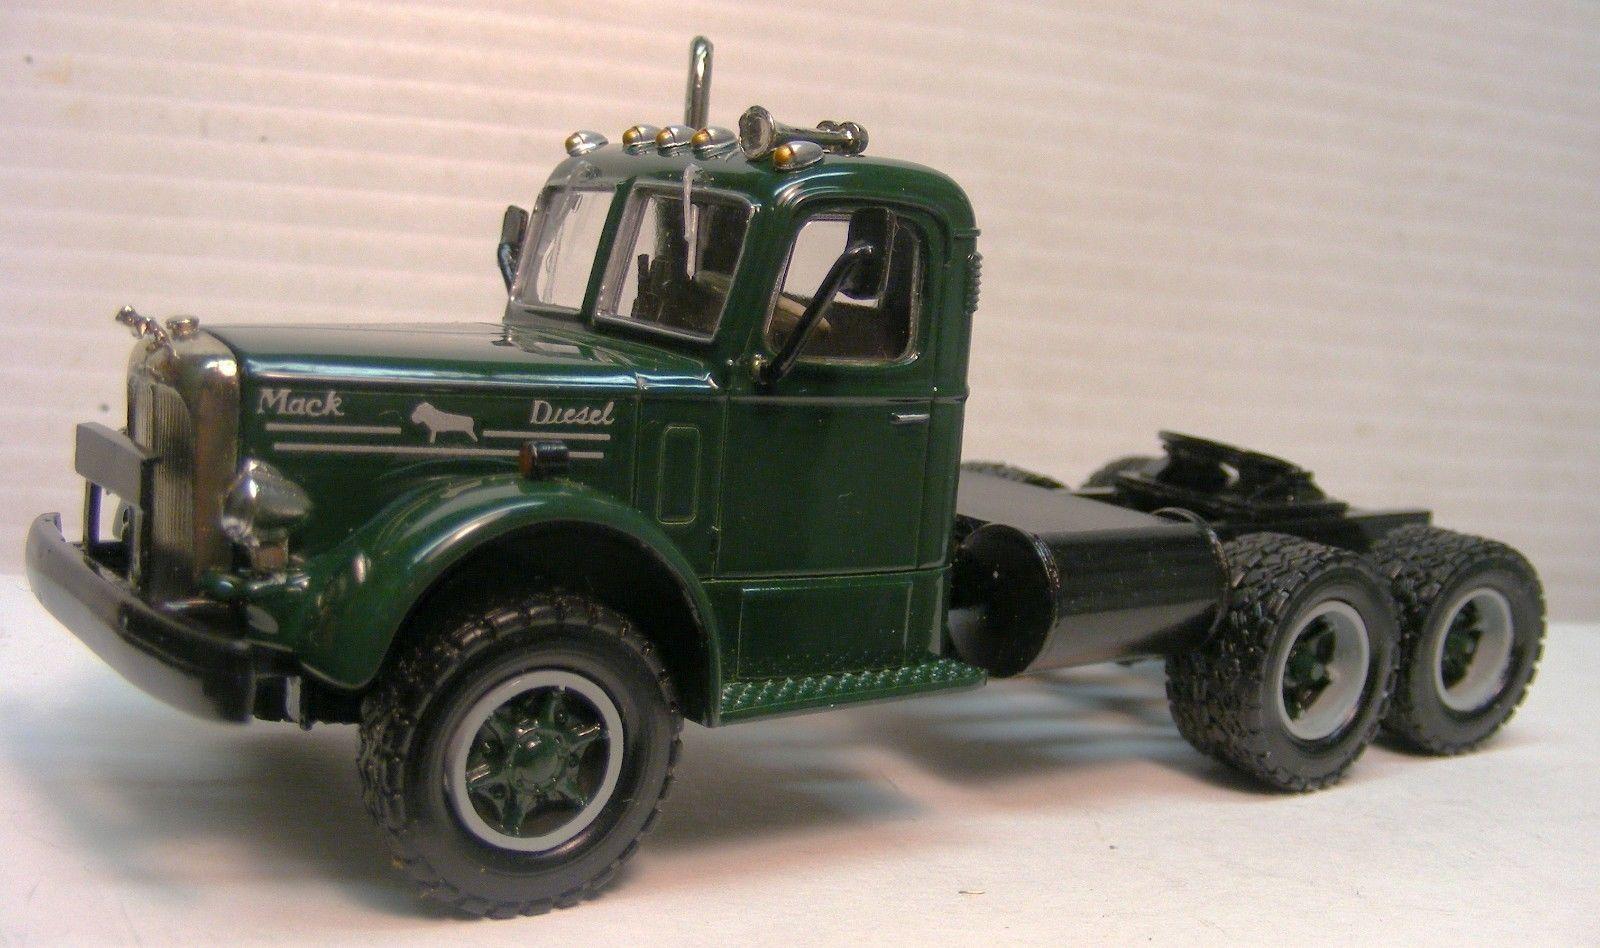 1/48 Scale LTL Western Mack Log Truck & Trailer. Has